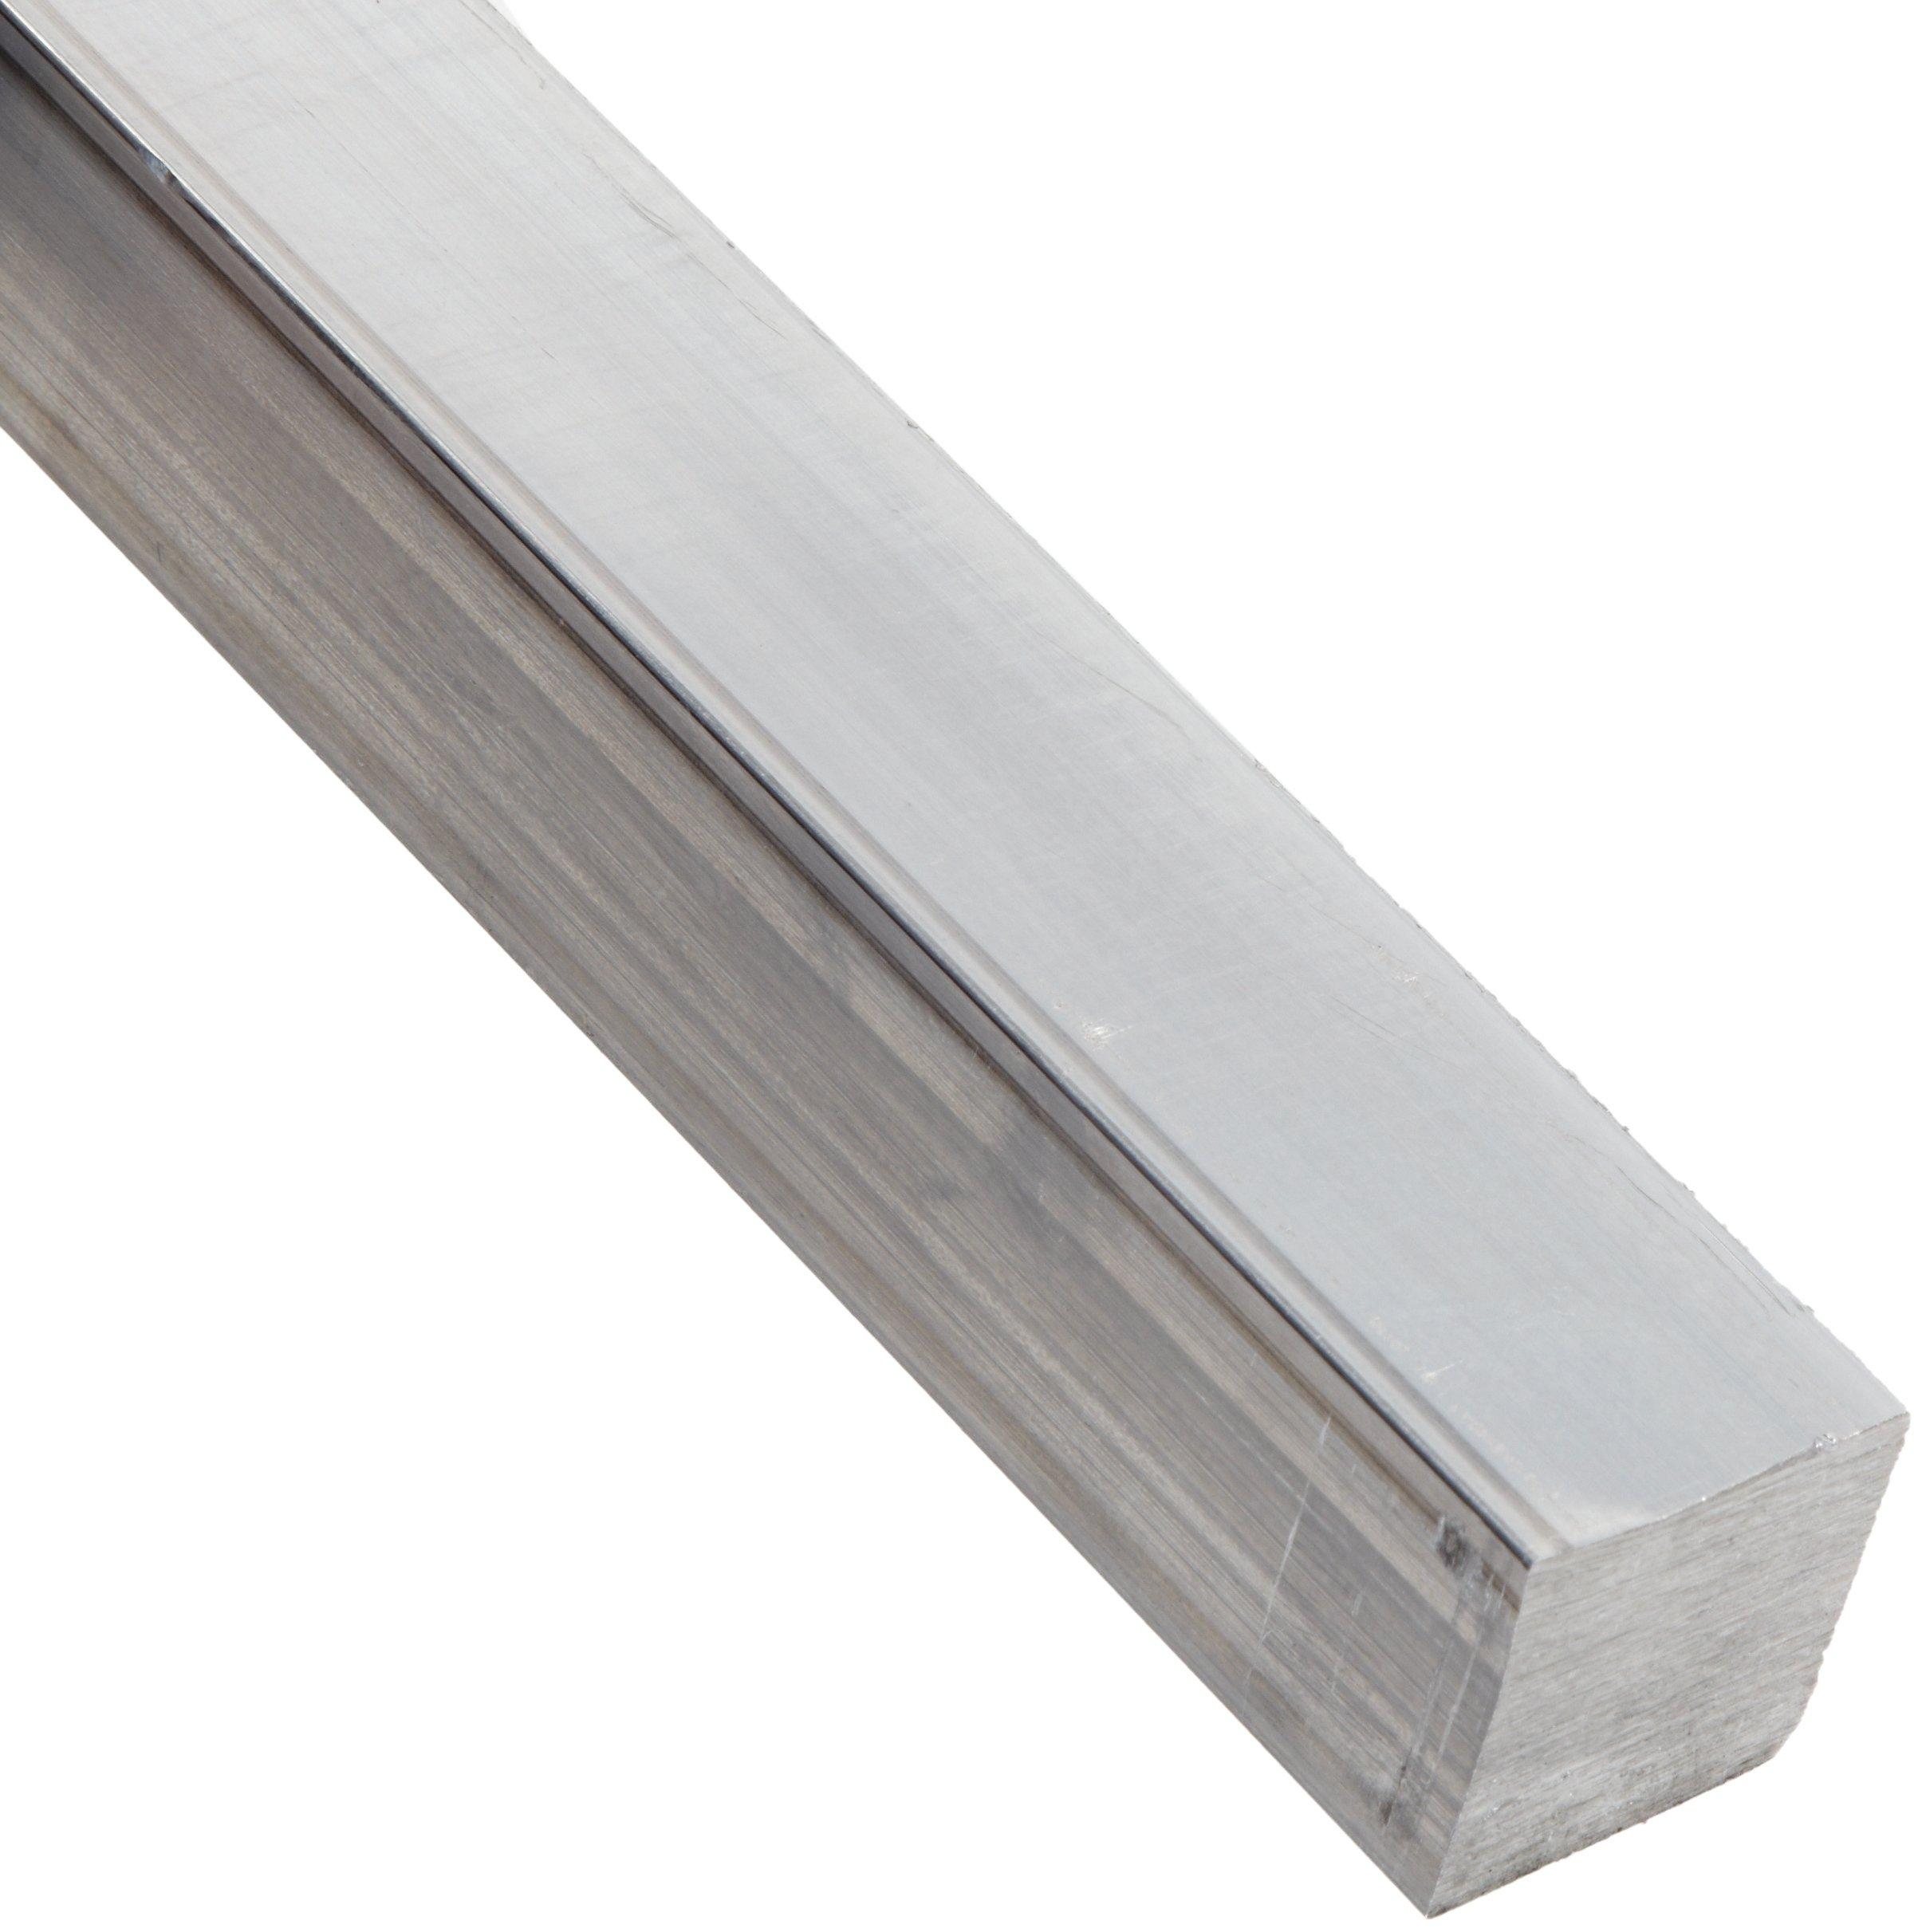 "6063 Aluminum Rectangular Bar, Unpolished (Mill) Finish, T52 Temper, AMS QQ-A-200/9/ASTM B221, 1/8"" Thickness, 1/2"" Width, 72"" Length"